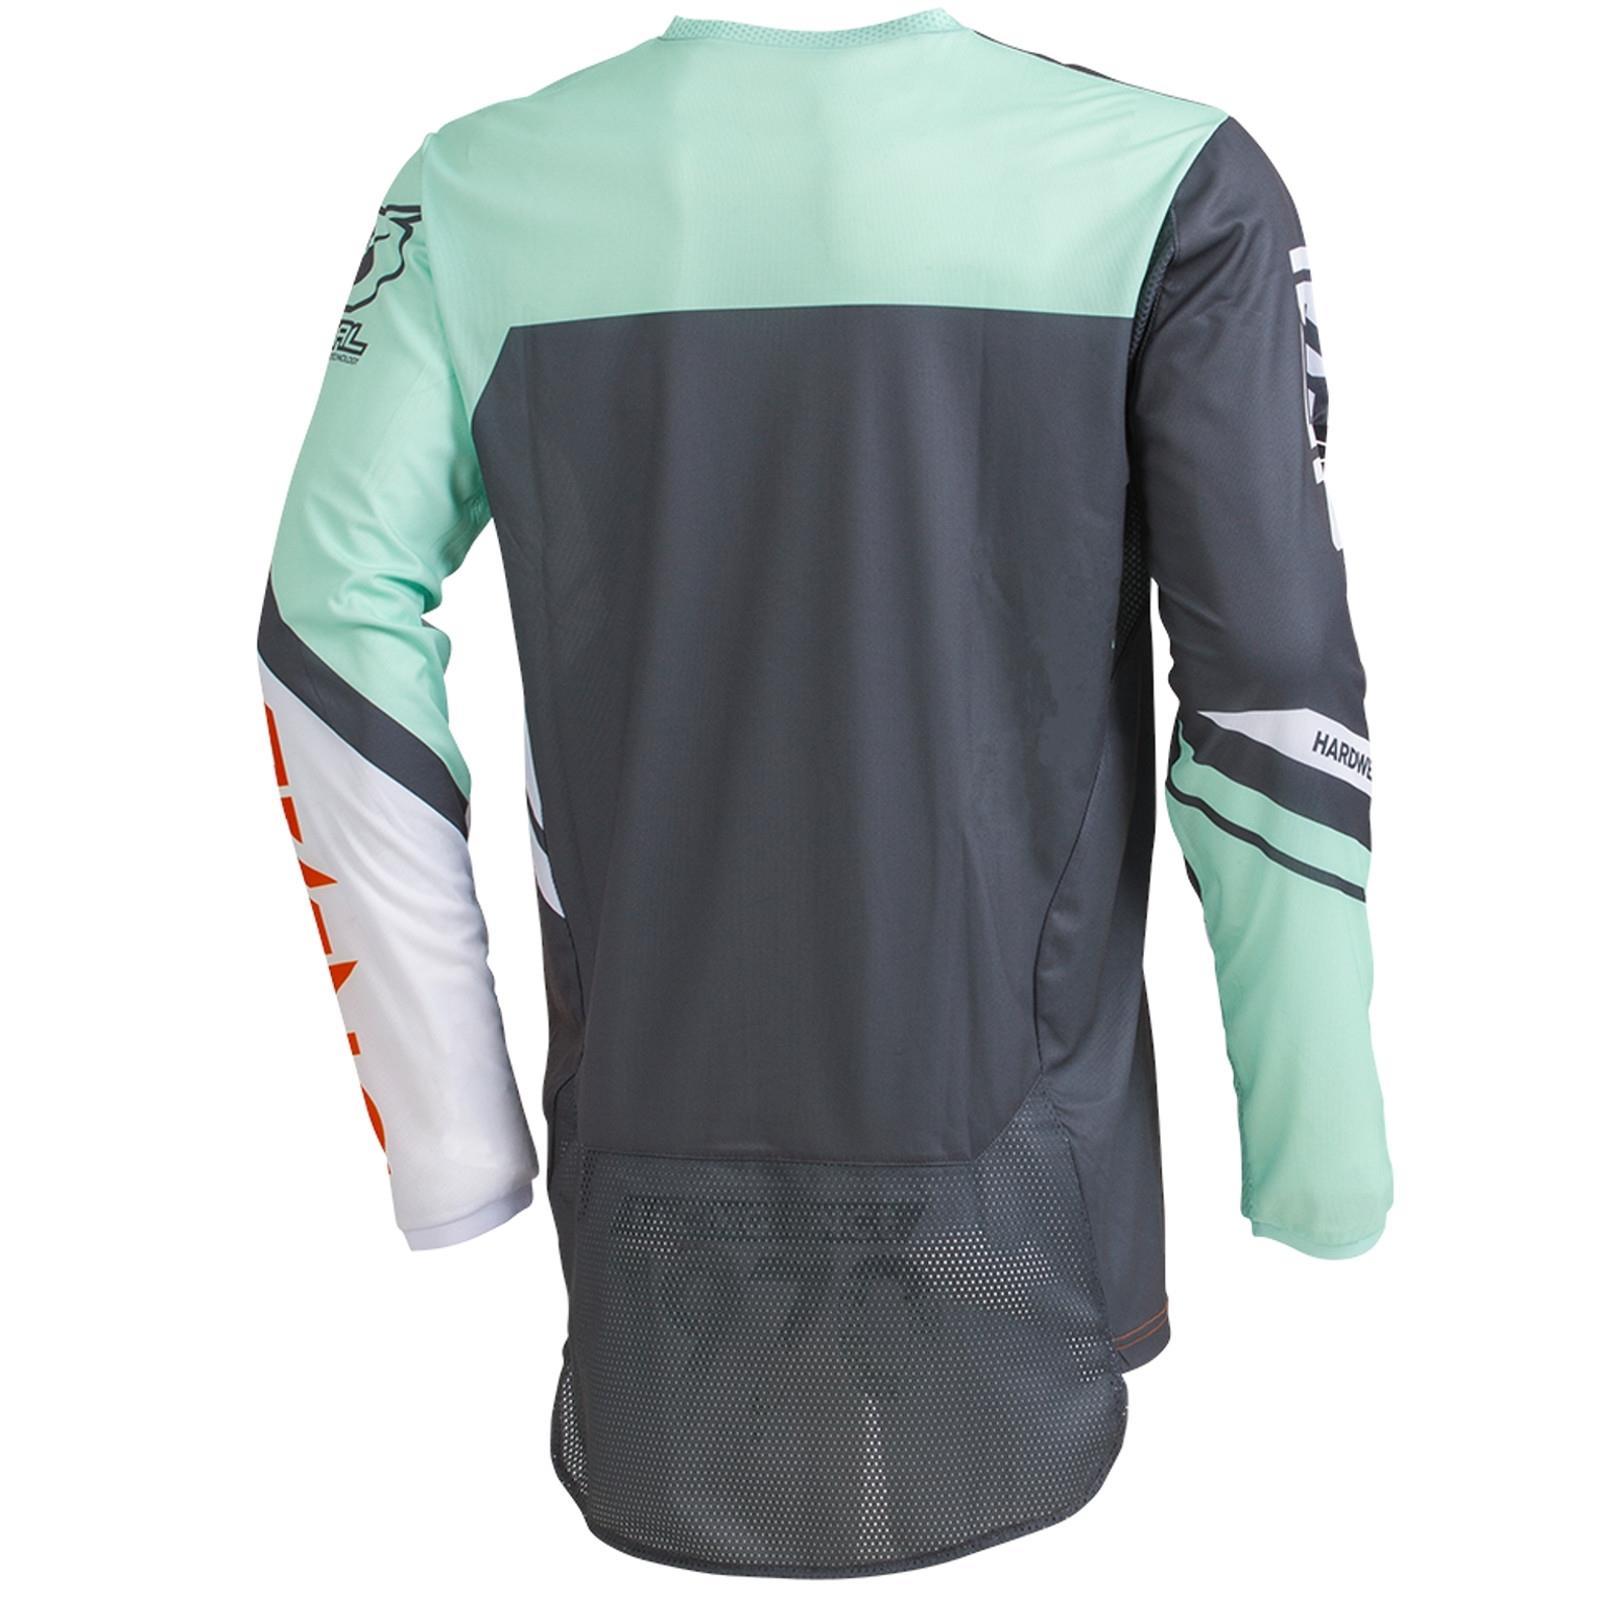 O-039-Neal-elemento-Mayhem-JERSEY-Racewear-Motocross-Maglia-MX-DH-FR-MTB-MOUNTAIN-BIKE miniatura 22